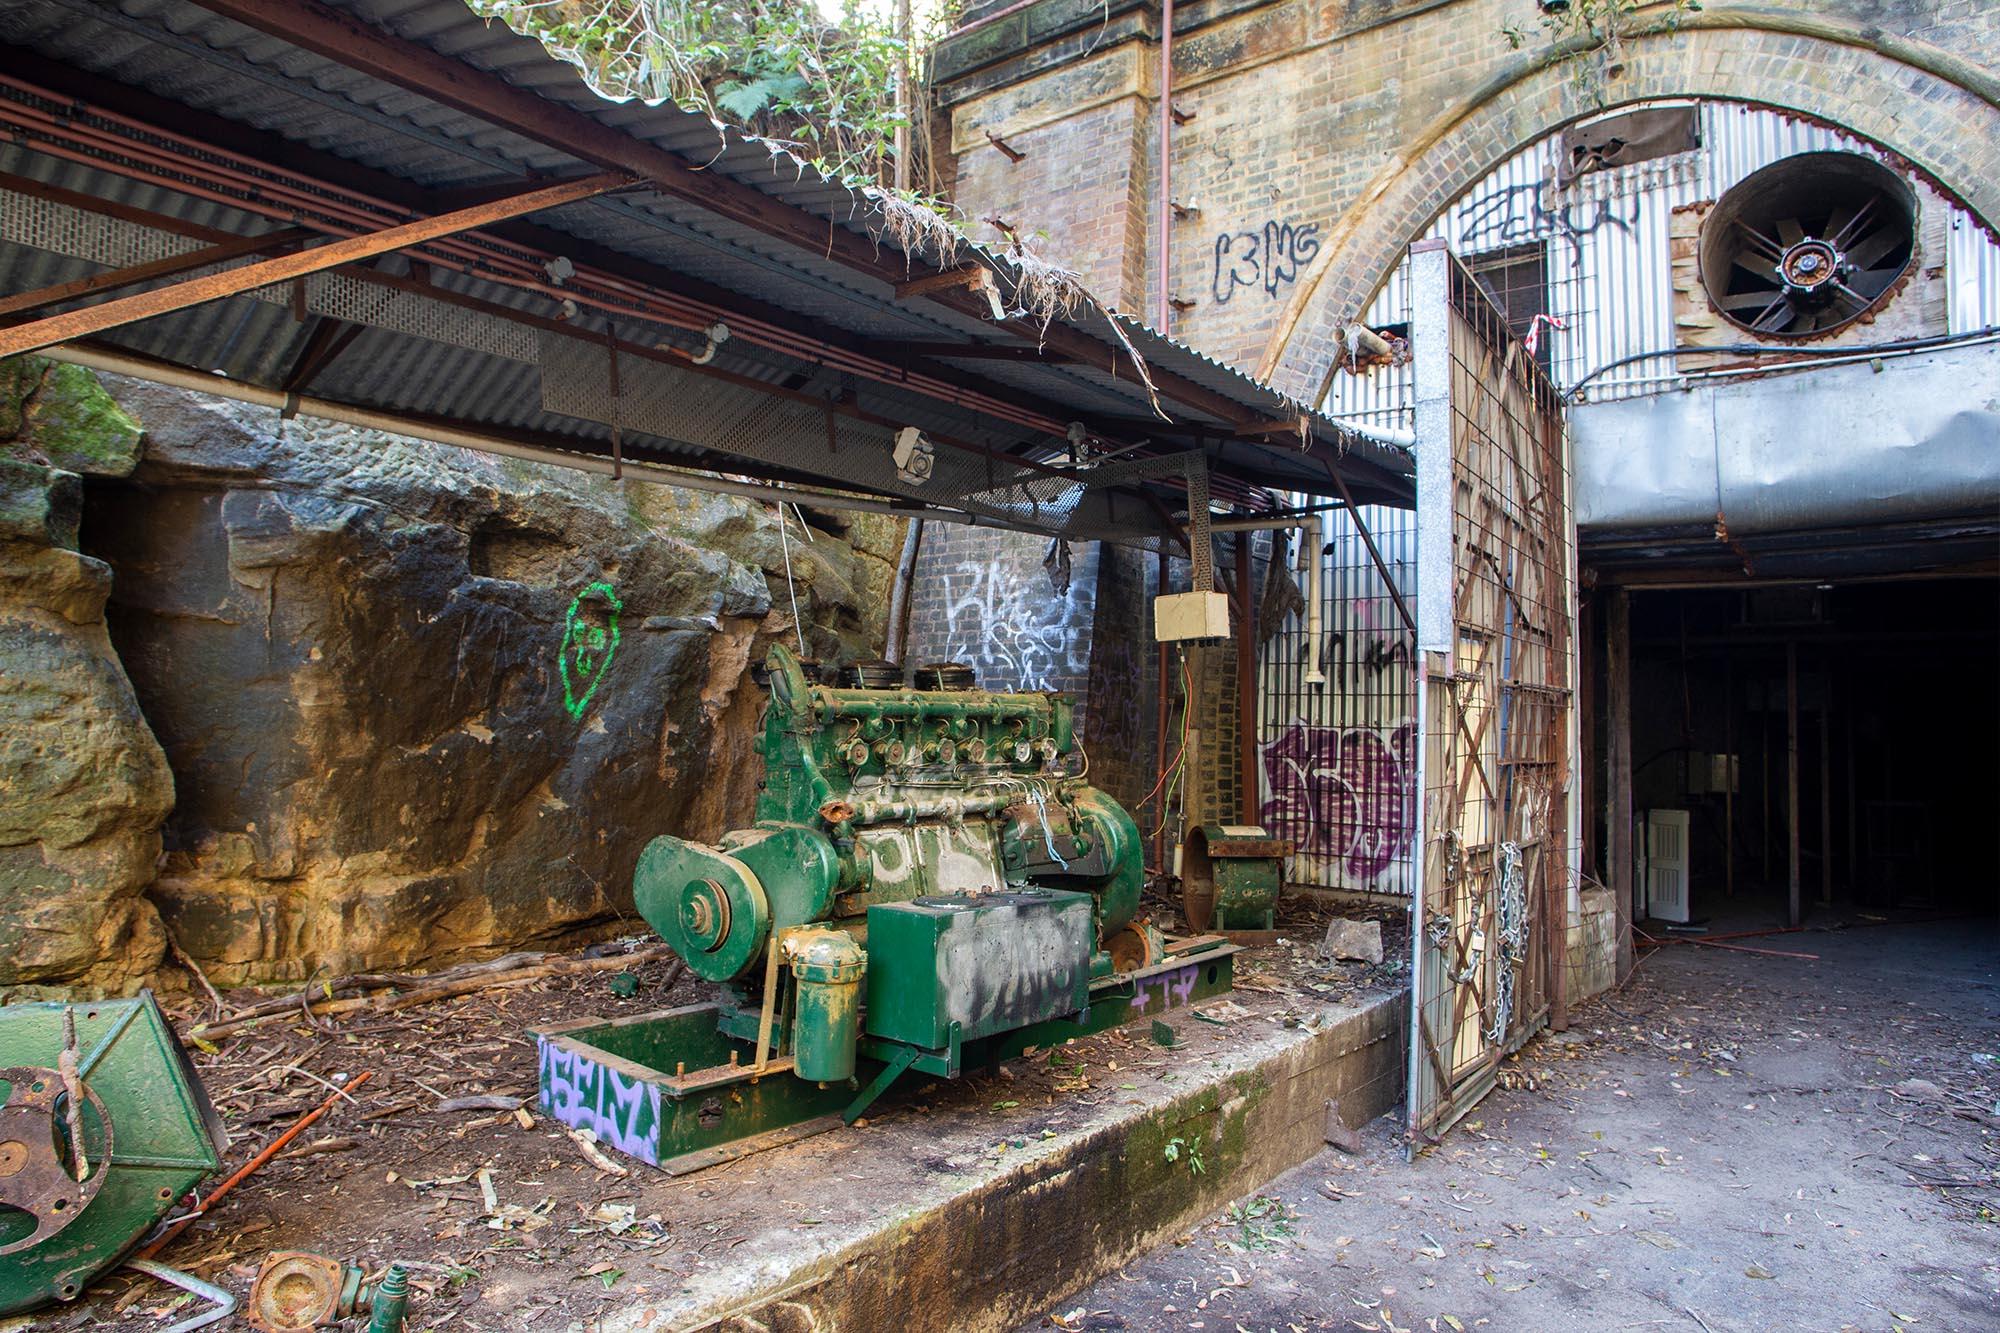 Glenbrook Railway Tunnel